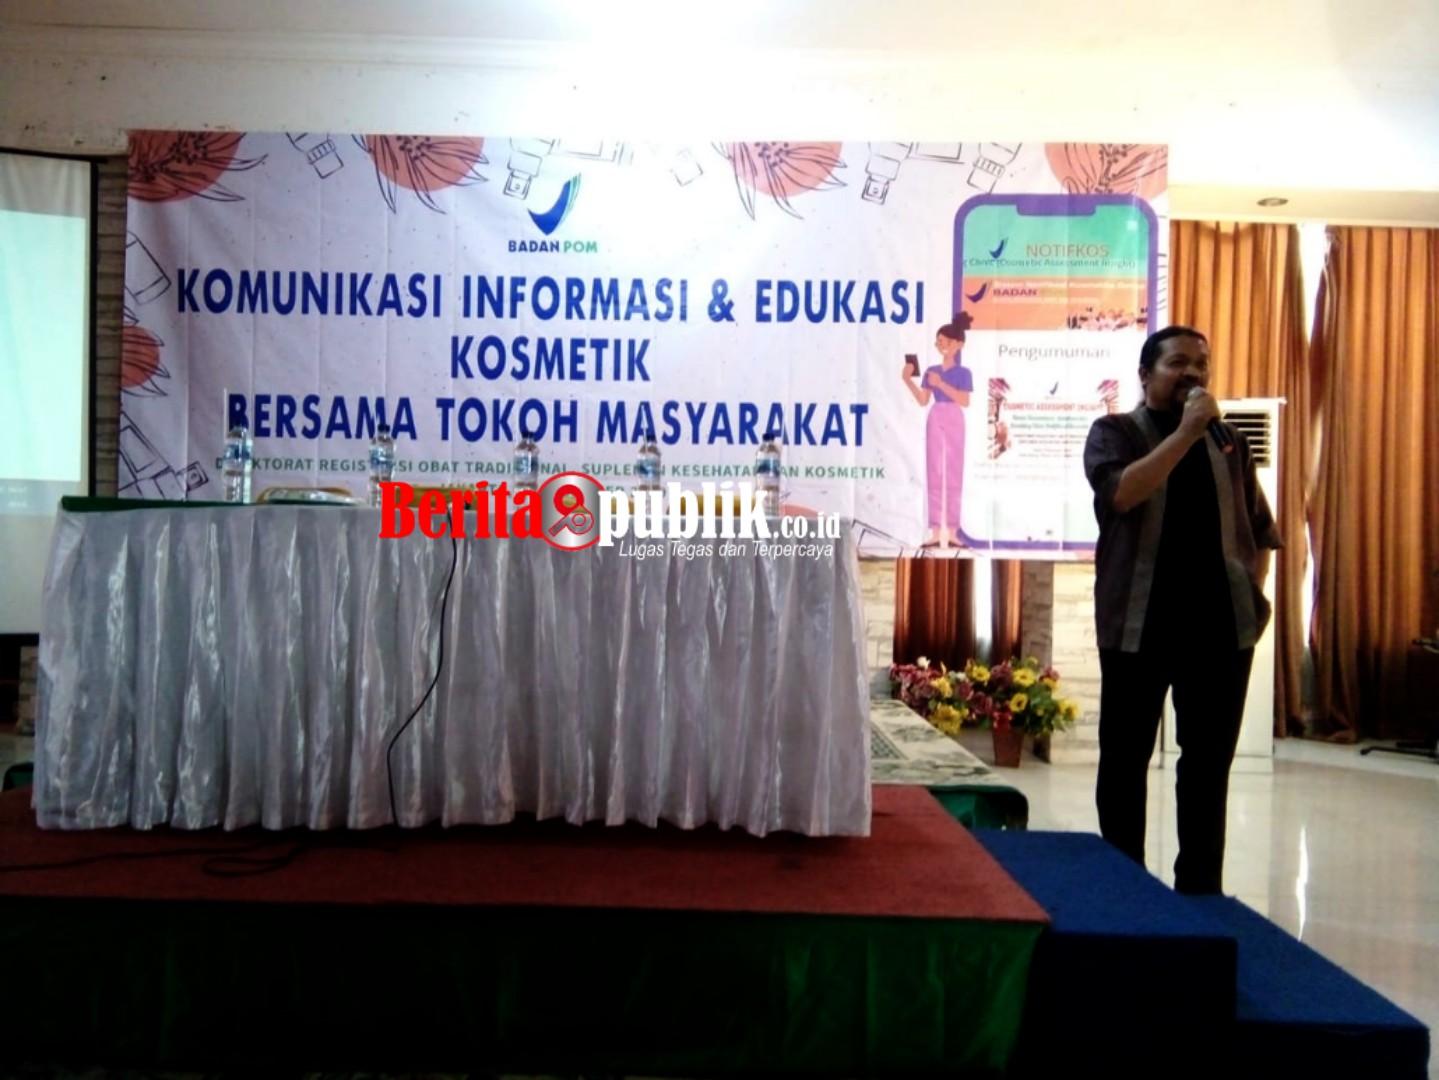 Anggota Komisi IX DPR RI dari Dapil Kota Bekasi - Depok, Nuroji